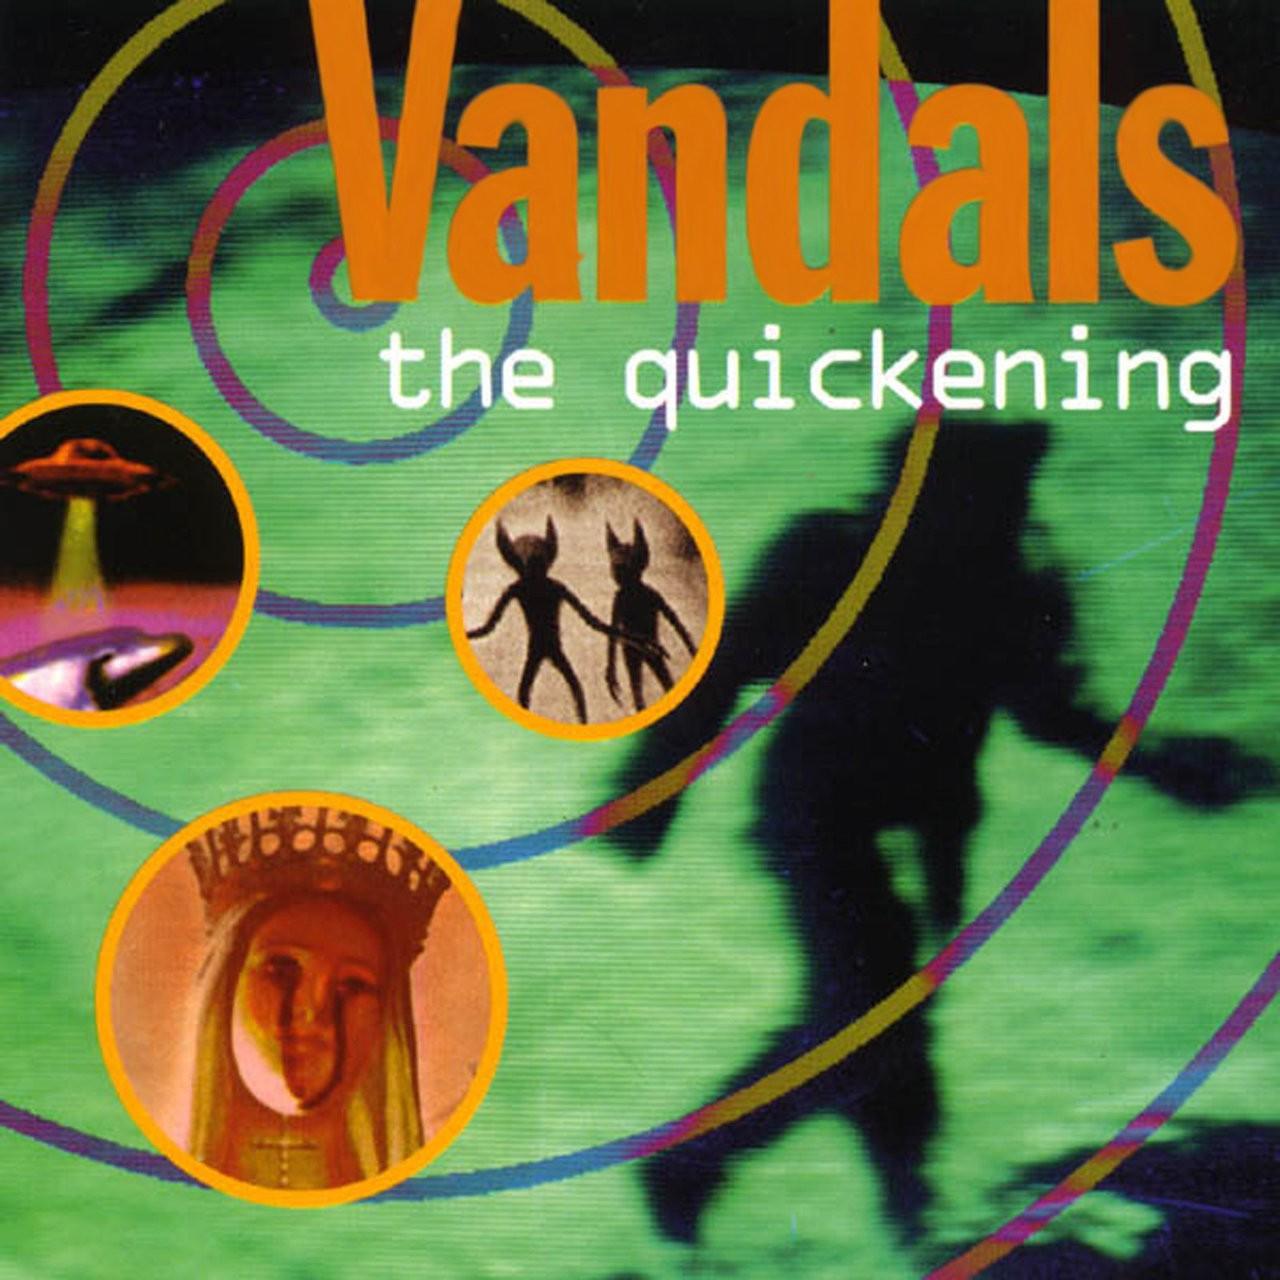 The Vandals - The Quickening LP